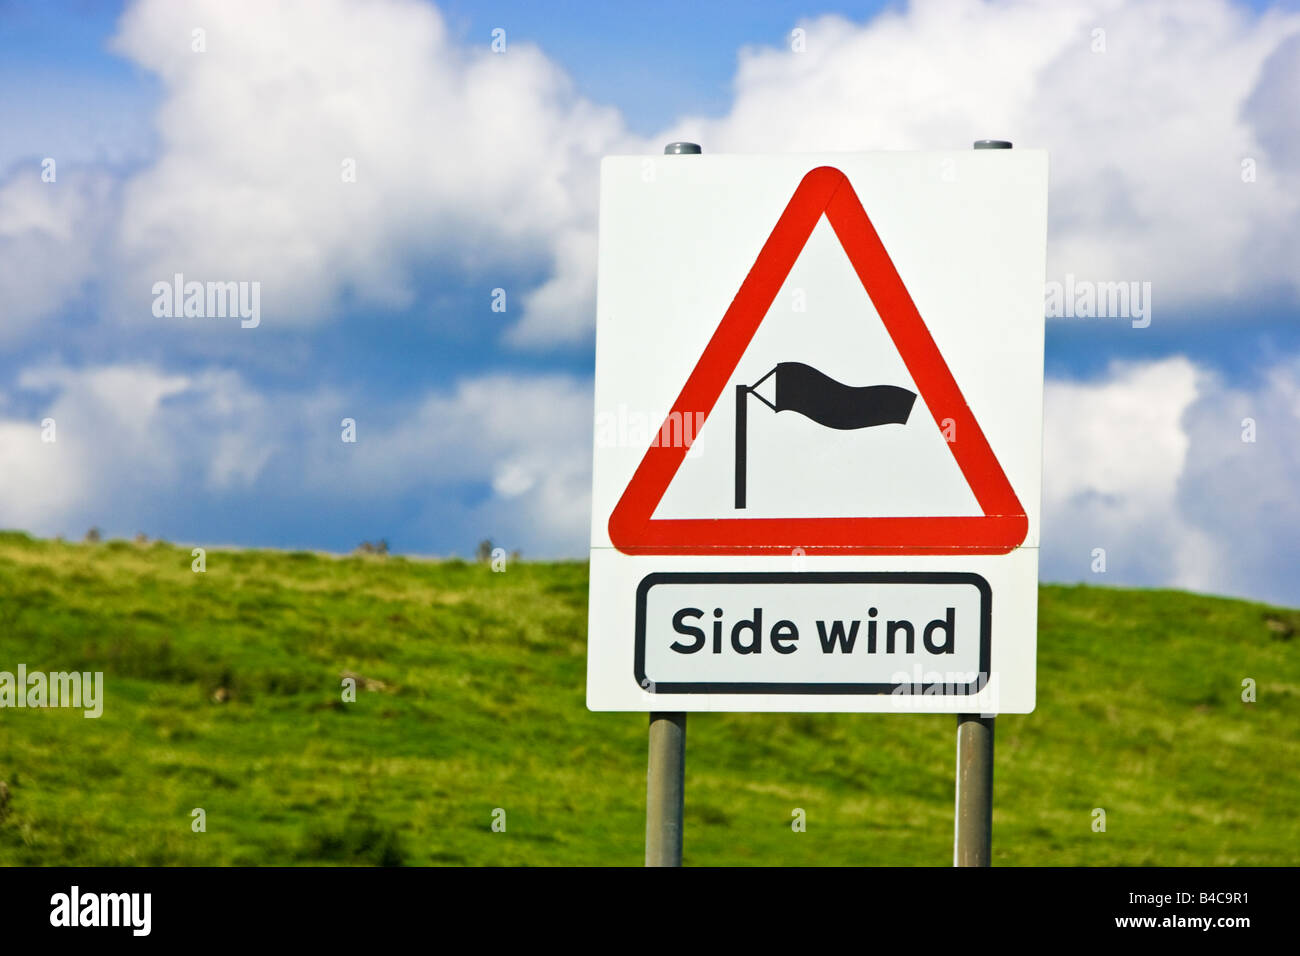 Warning road sign of Side Winds England UK - Stock Image